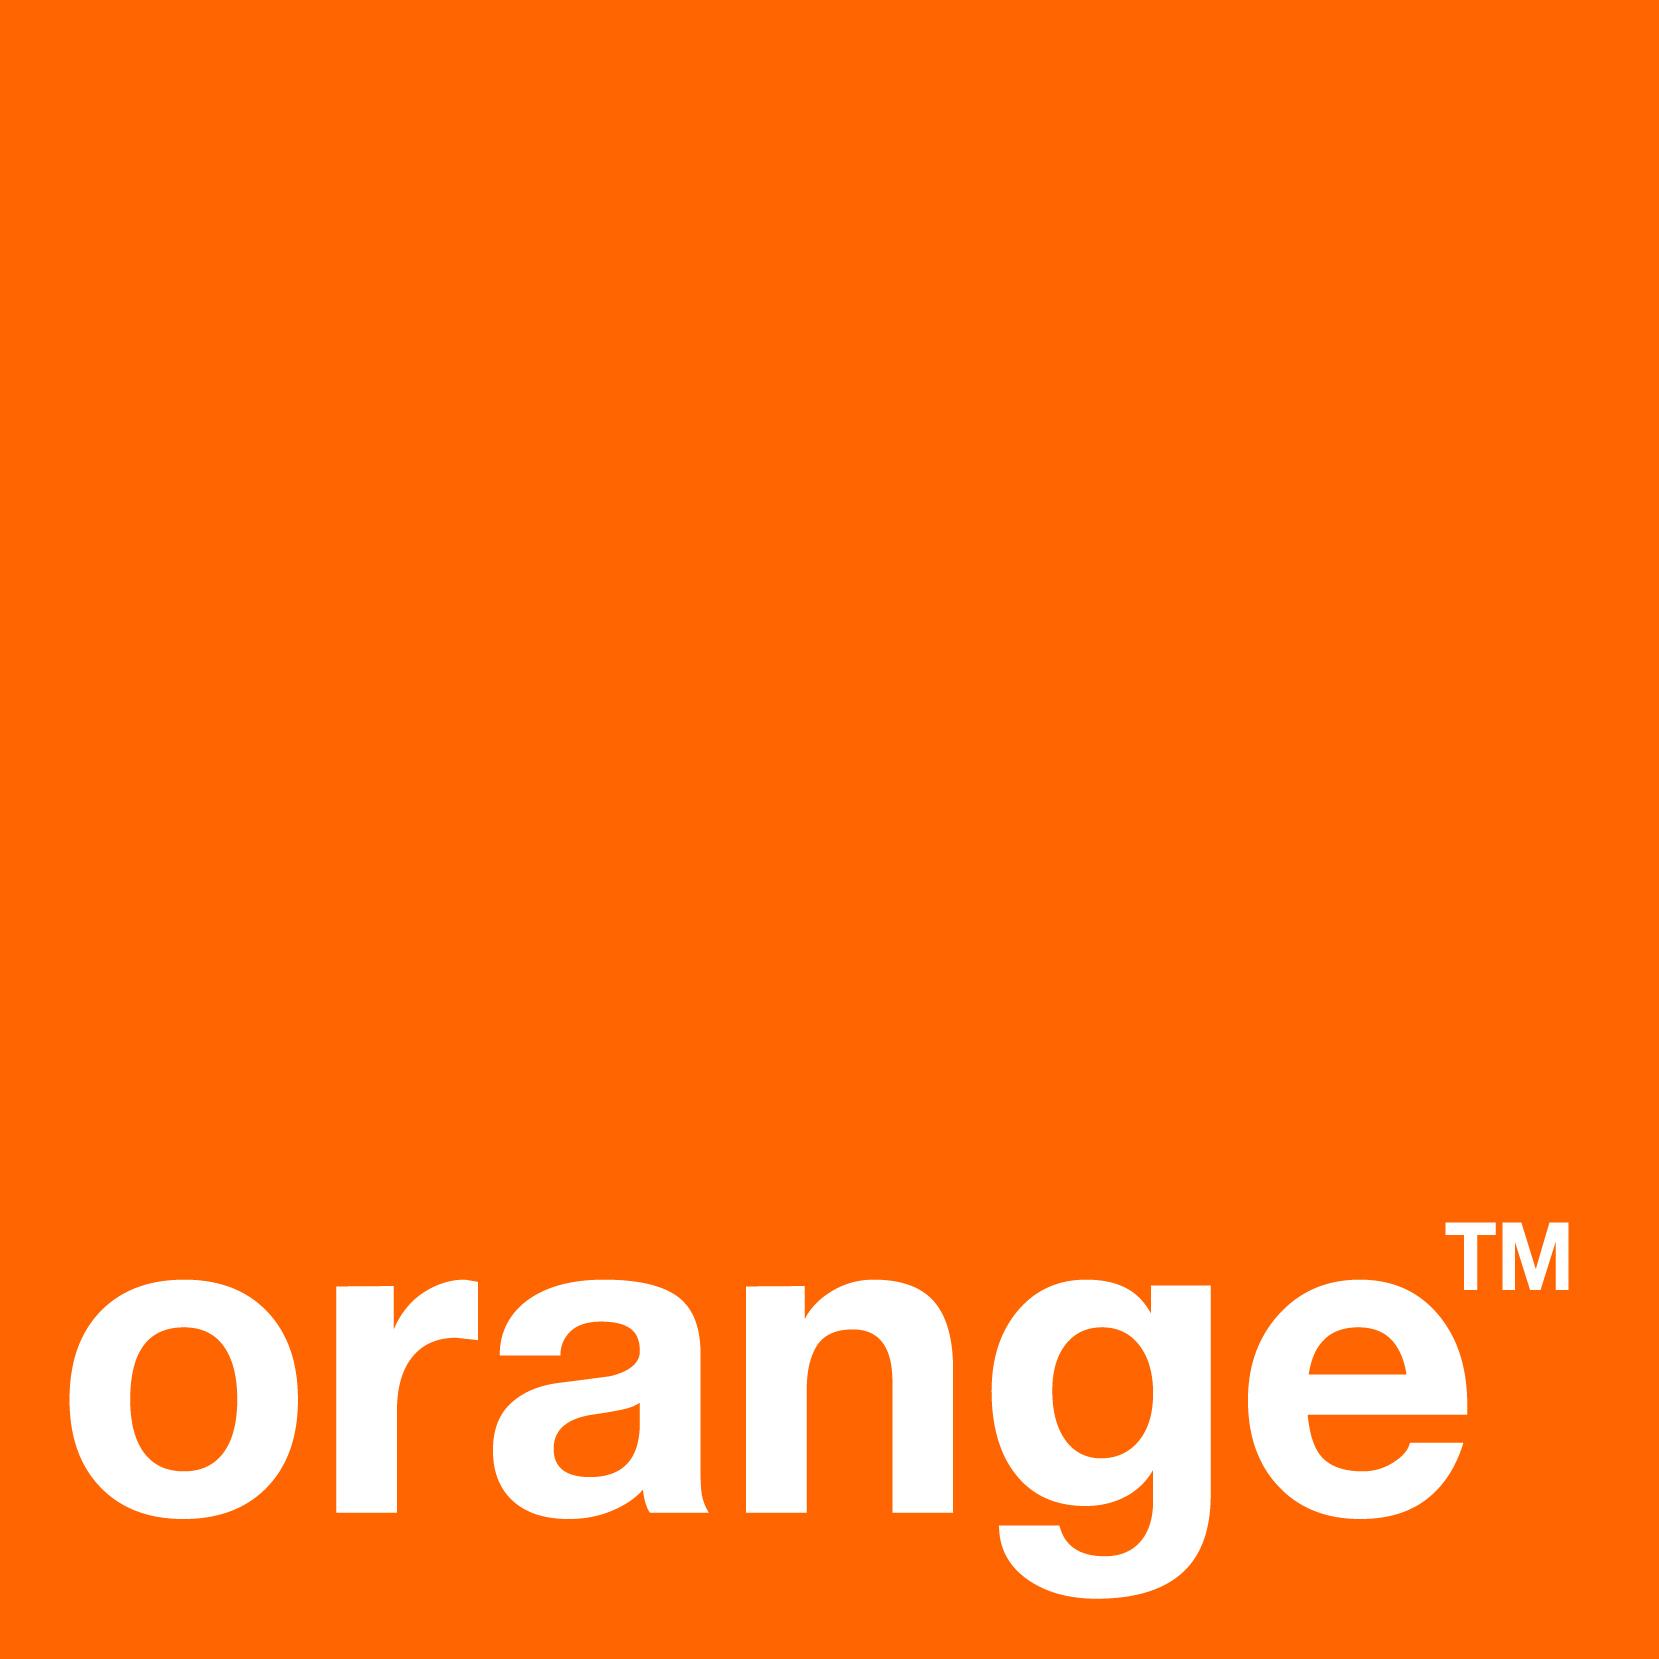 logo-orange-hd.jpg